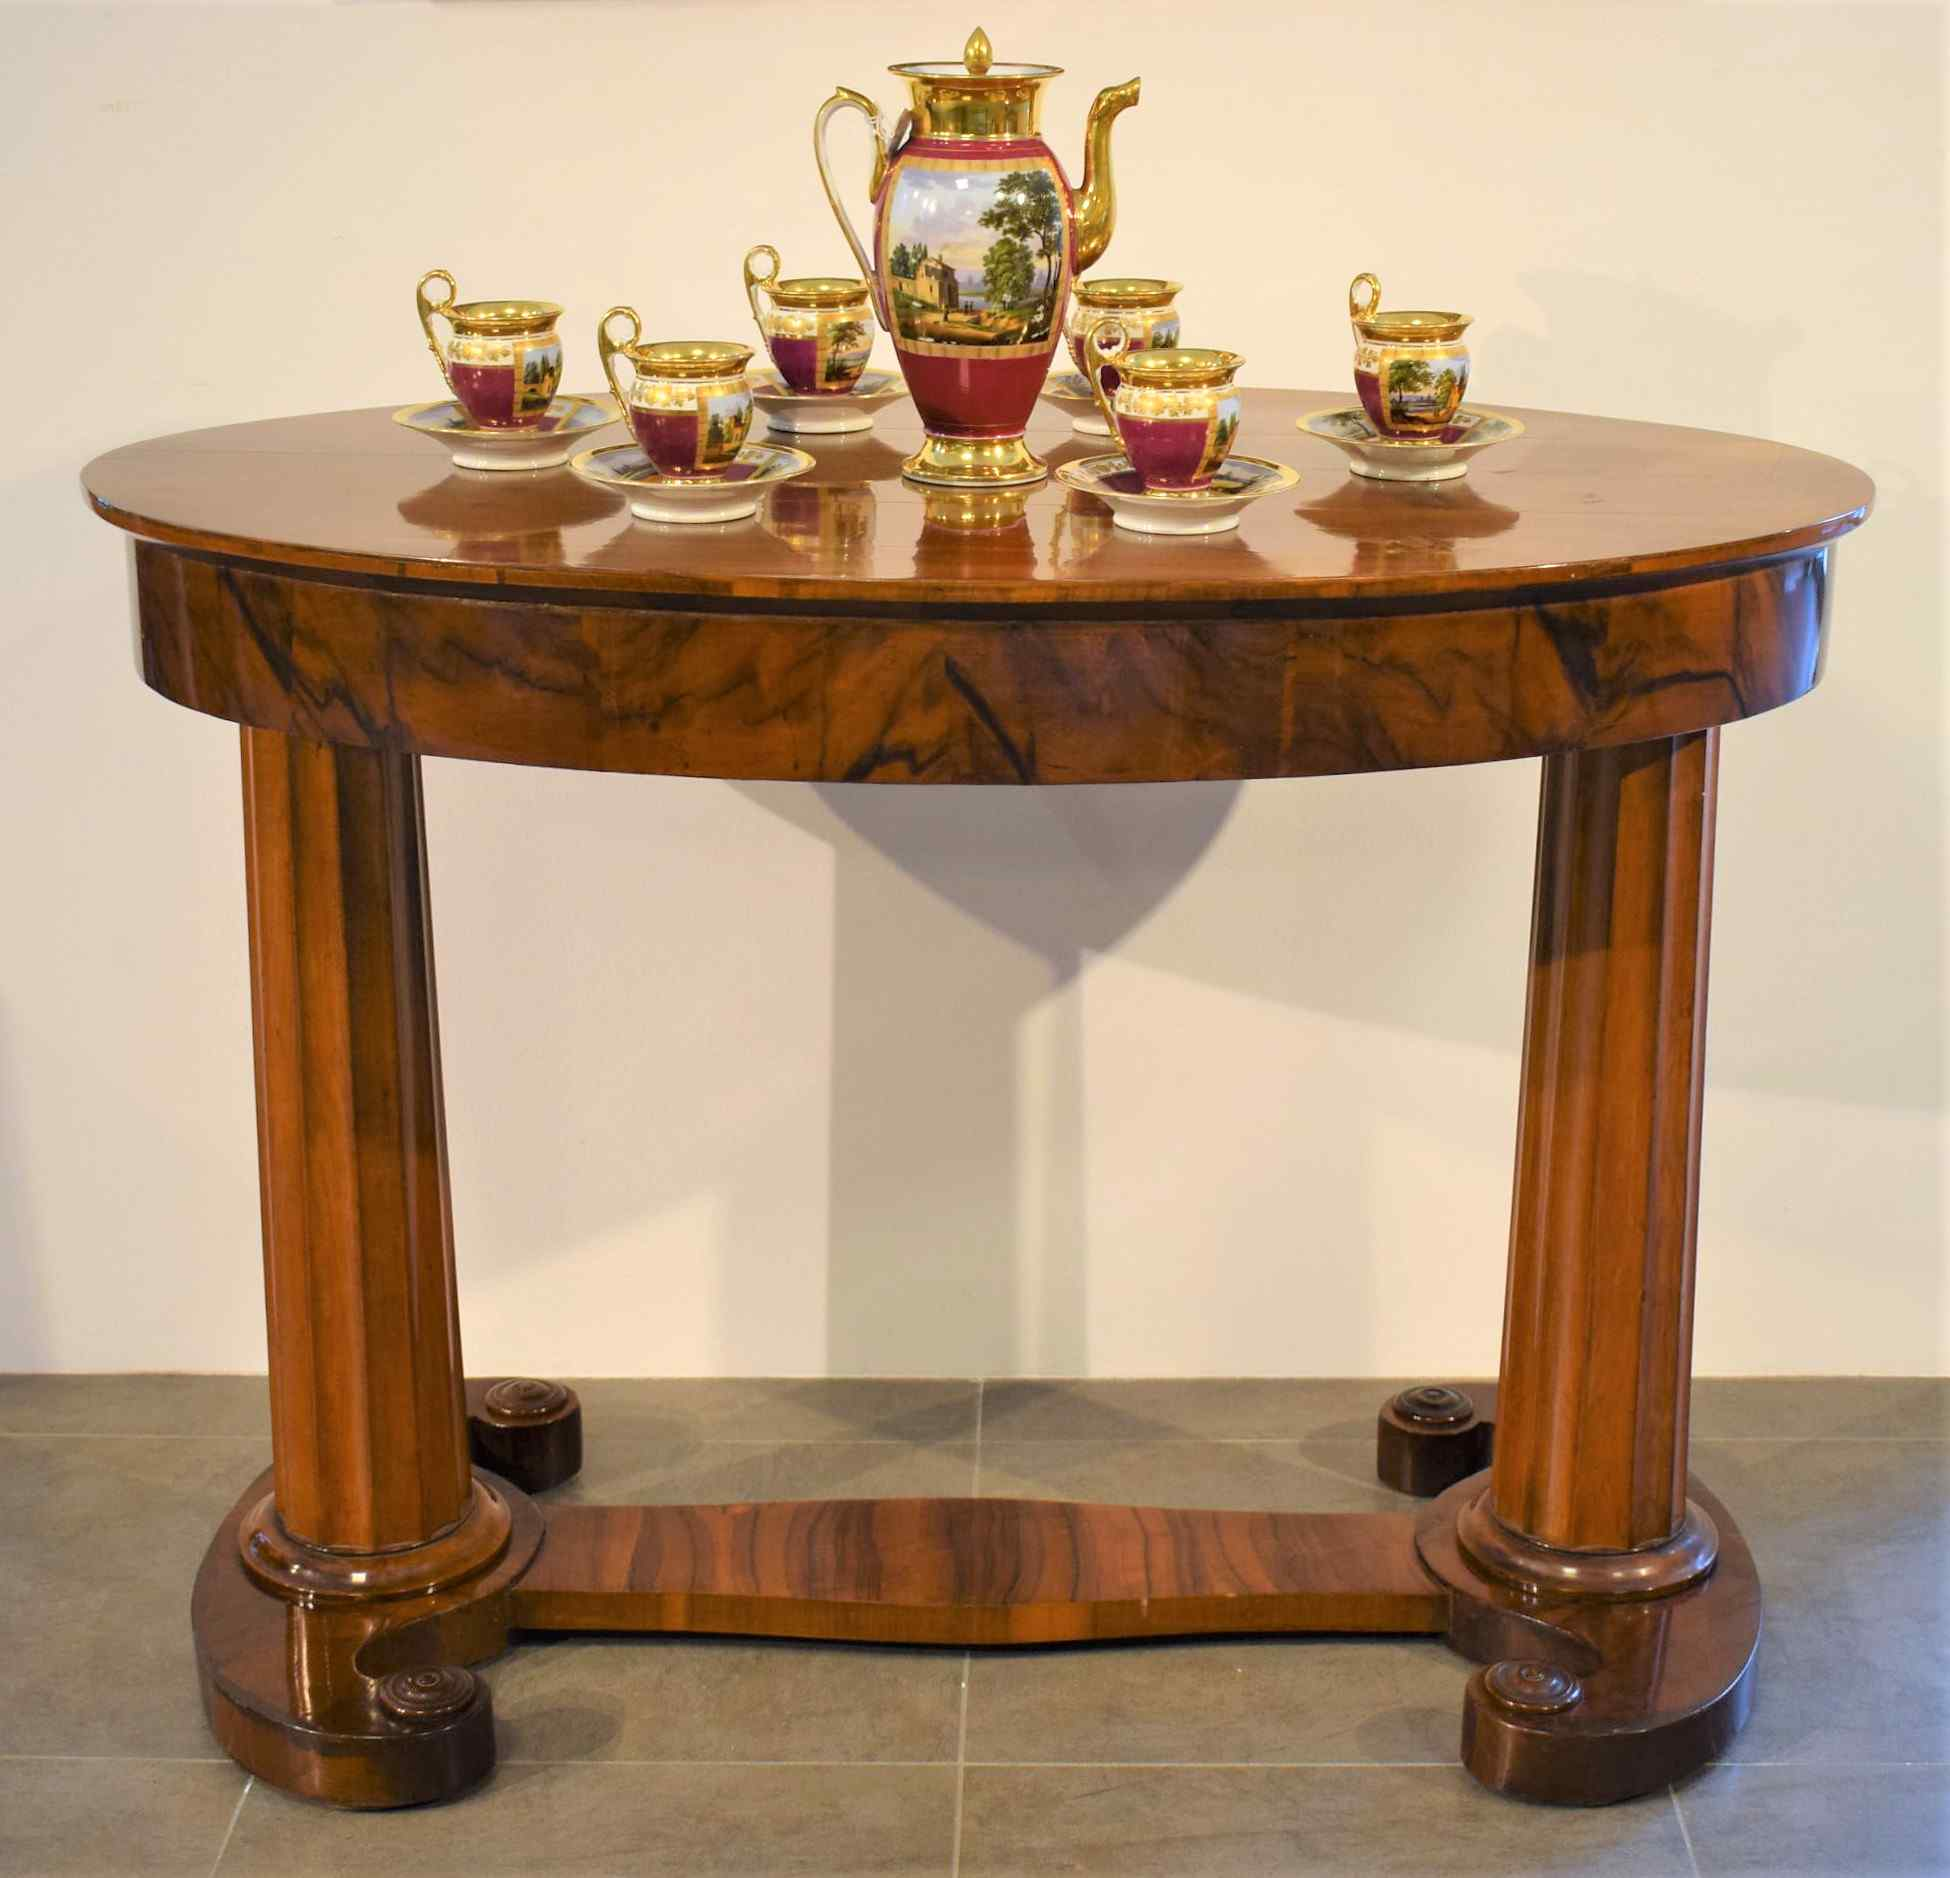 Biedermeier coffee table / desk by Josef Danhauser